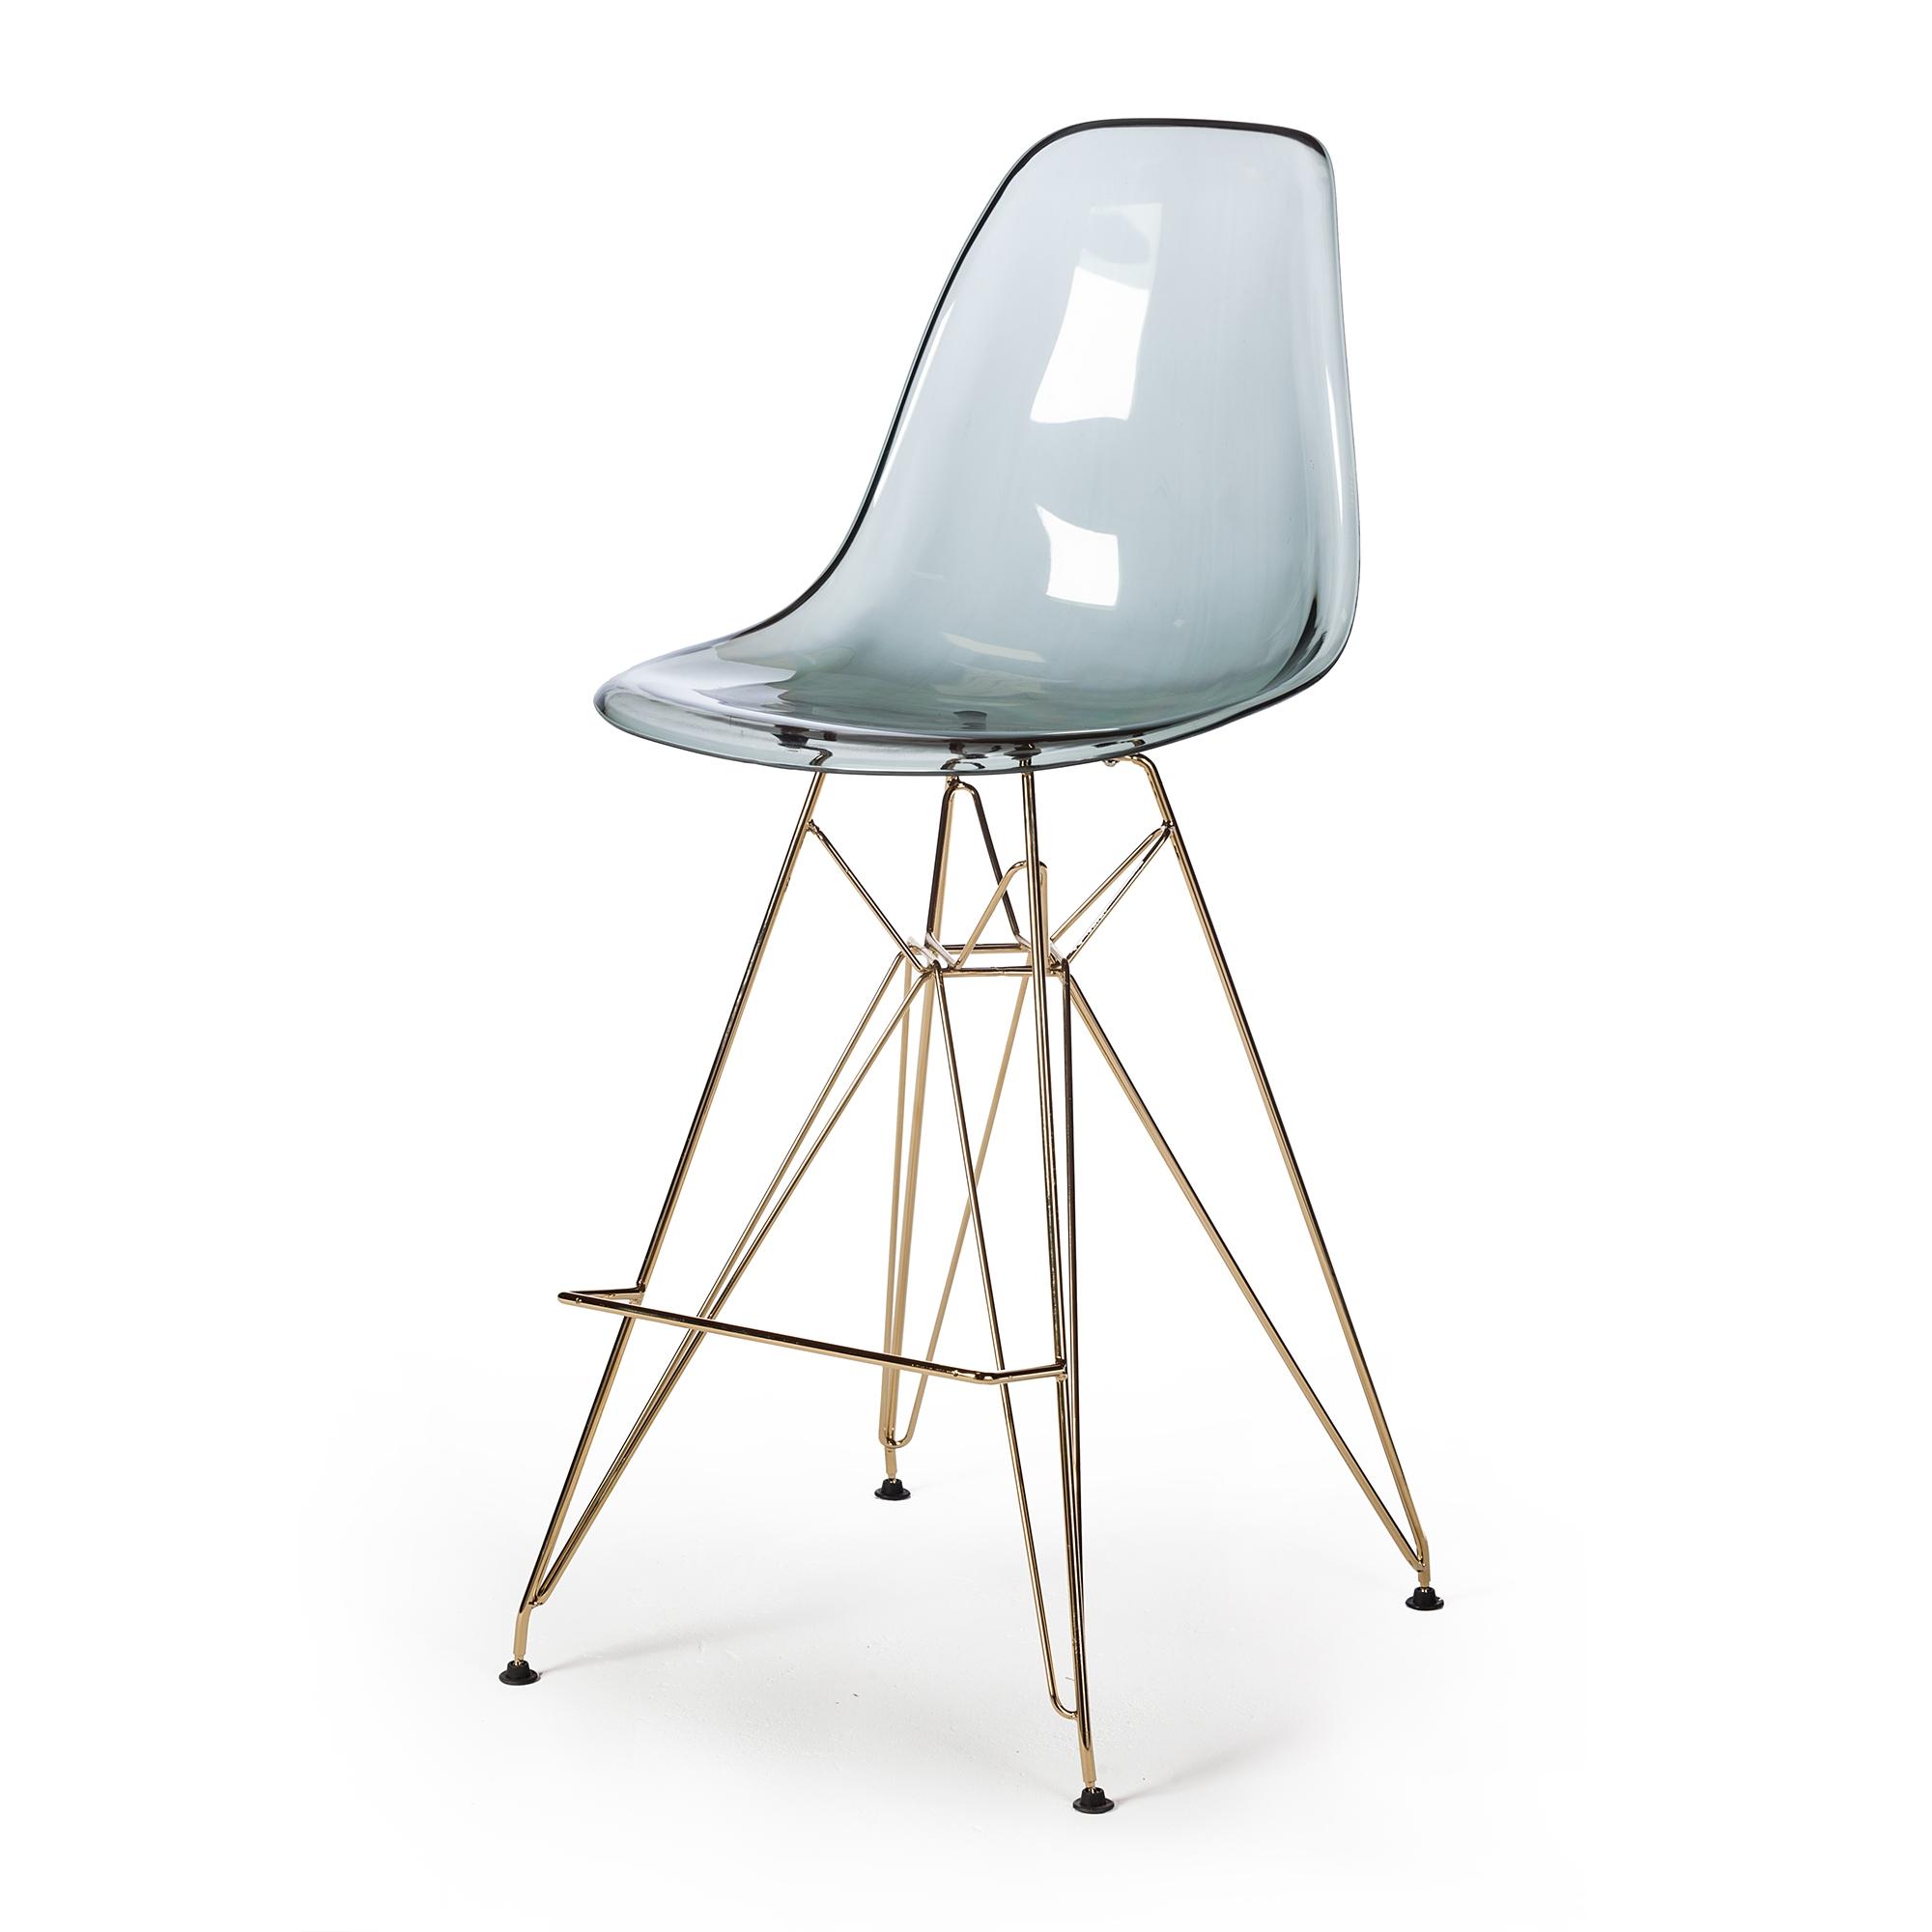 Excellent Molded Acrylic Counter Stool In Translucent Smoke And Gold Finish Legs Inzonedesignstudio Interior Chair Design Inzonedesignstudiocom